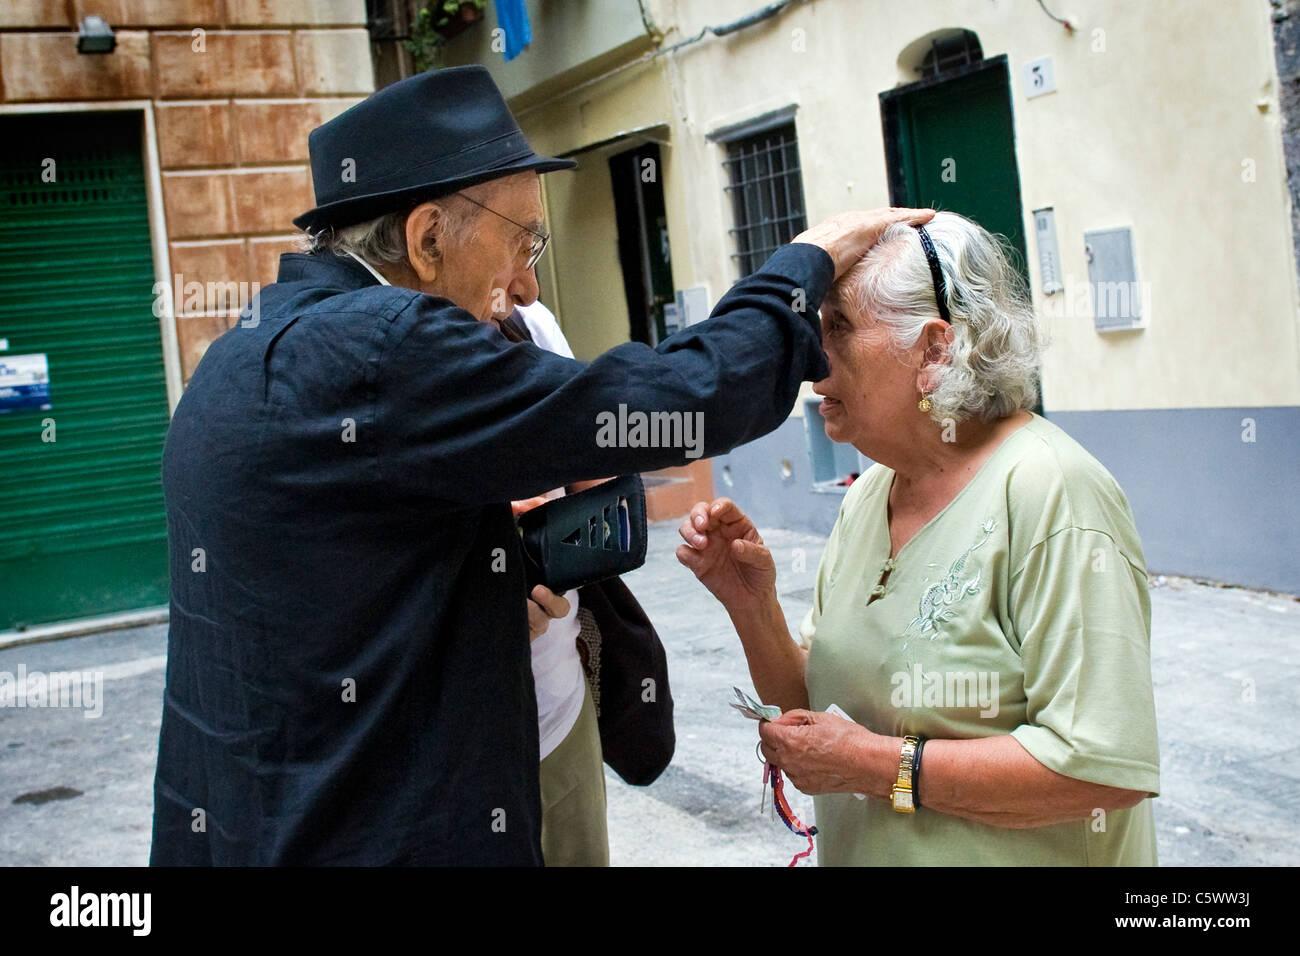 Don Andrea blesses a Peruvian woman. Don Andrea Gallo, Genoa, Italy - Stock Image